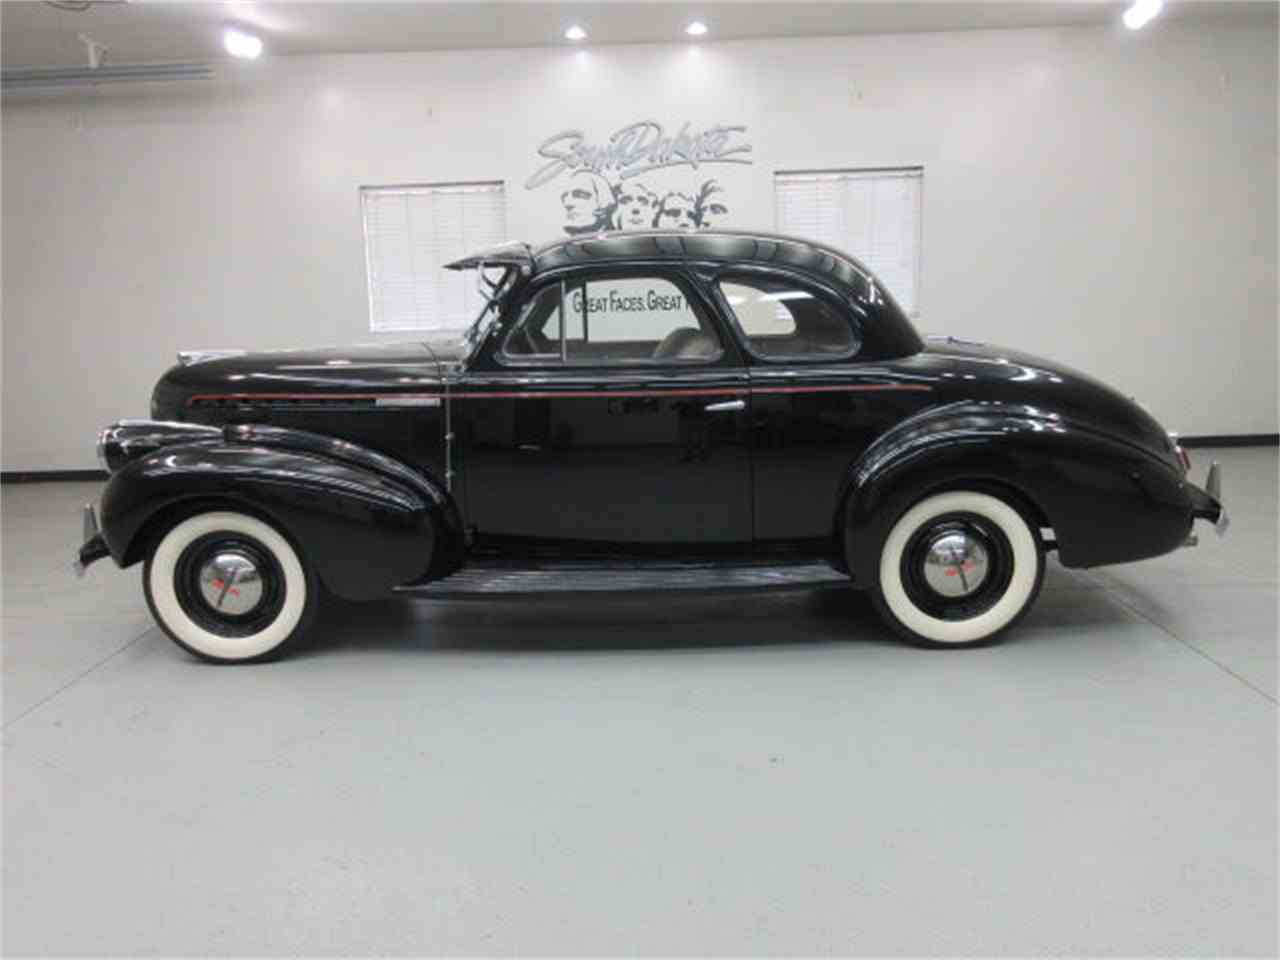 best small cars under 6000. Black Bedroom Furniture Sets. Home Design Ideas